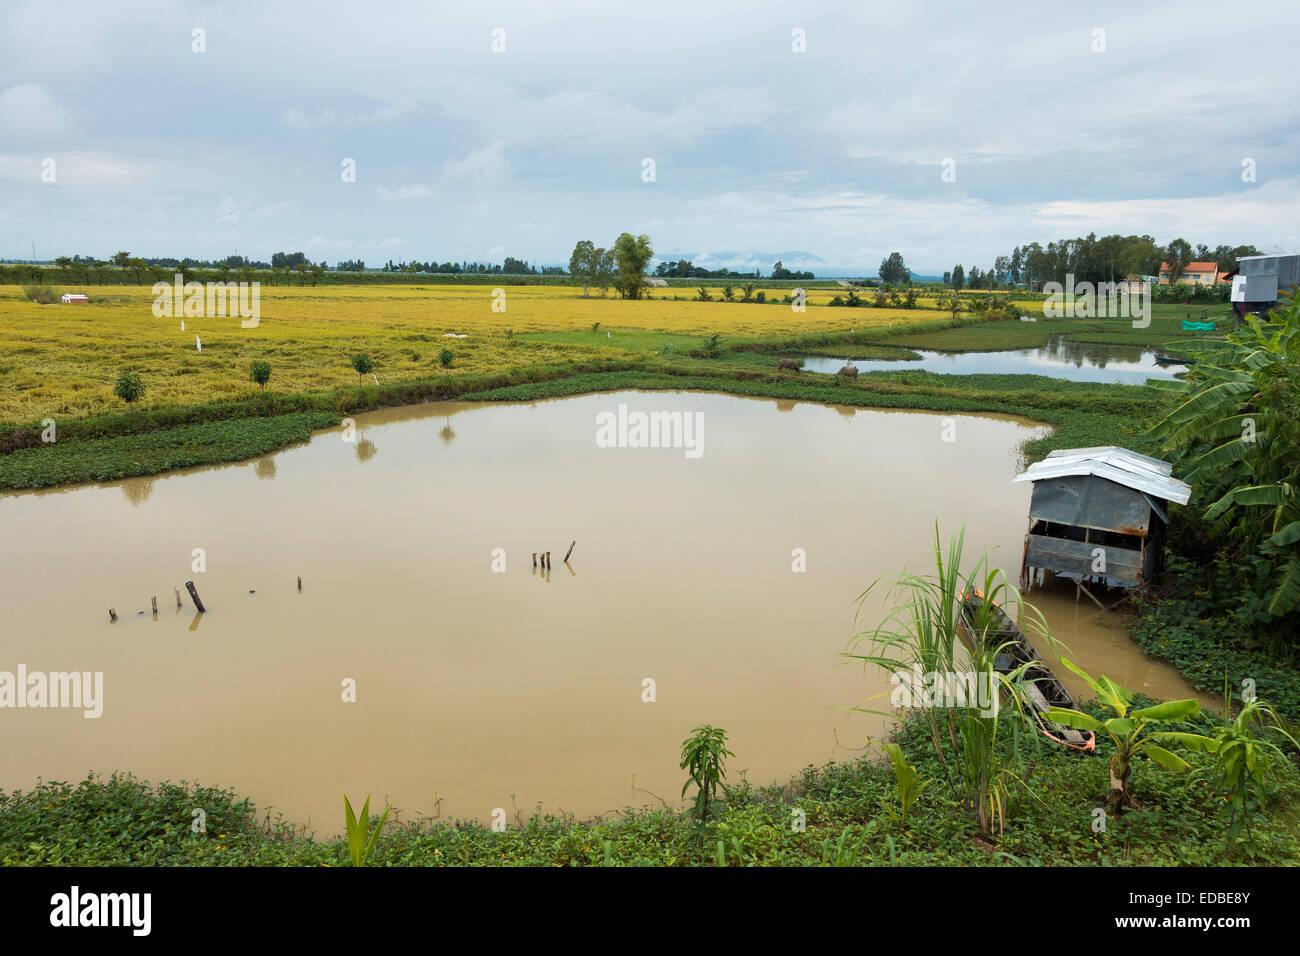 Rice paddies, Chao Doc, Vietnam - Stock Image